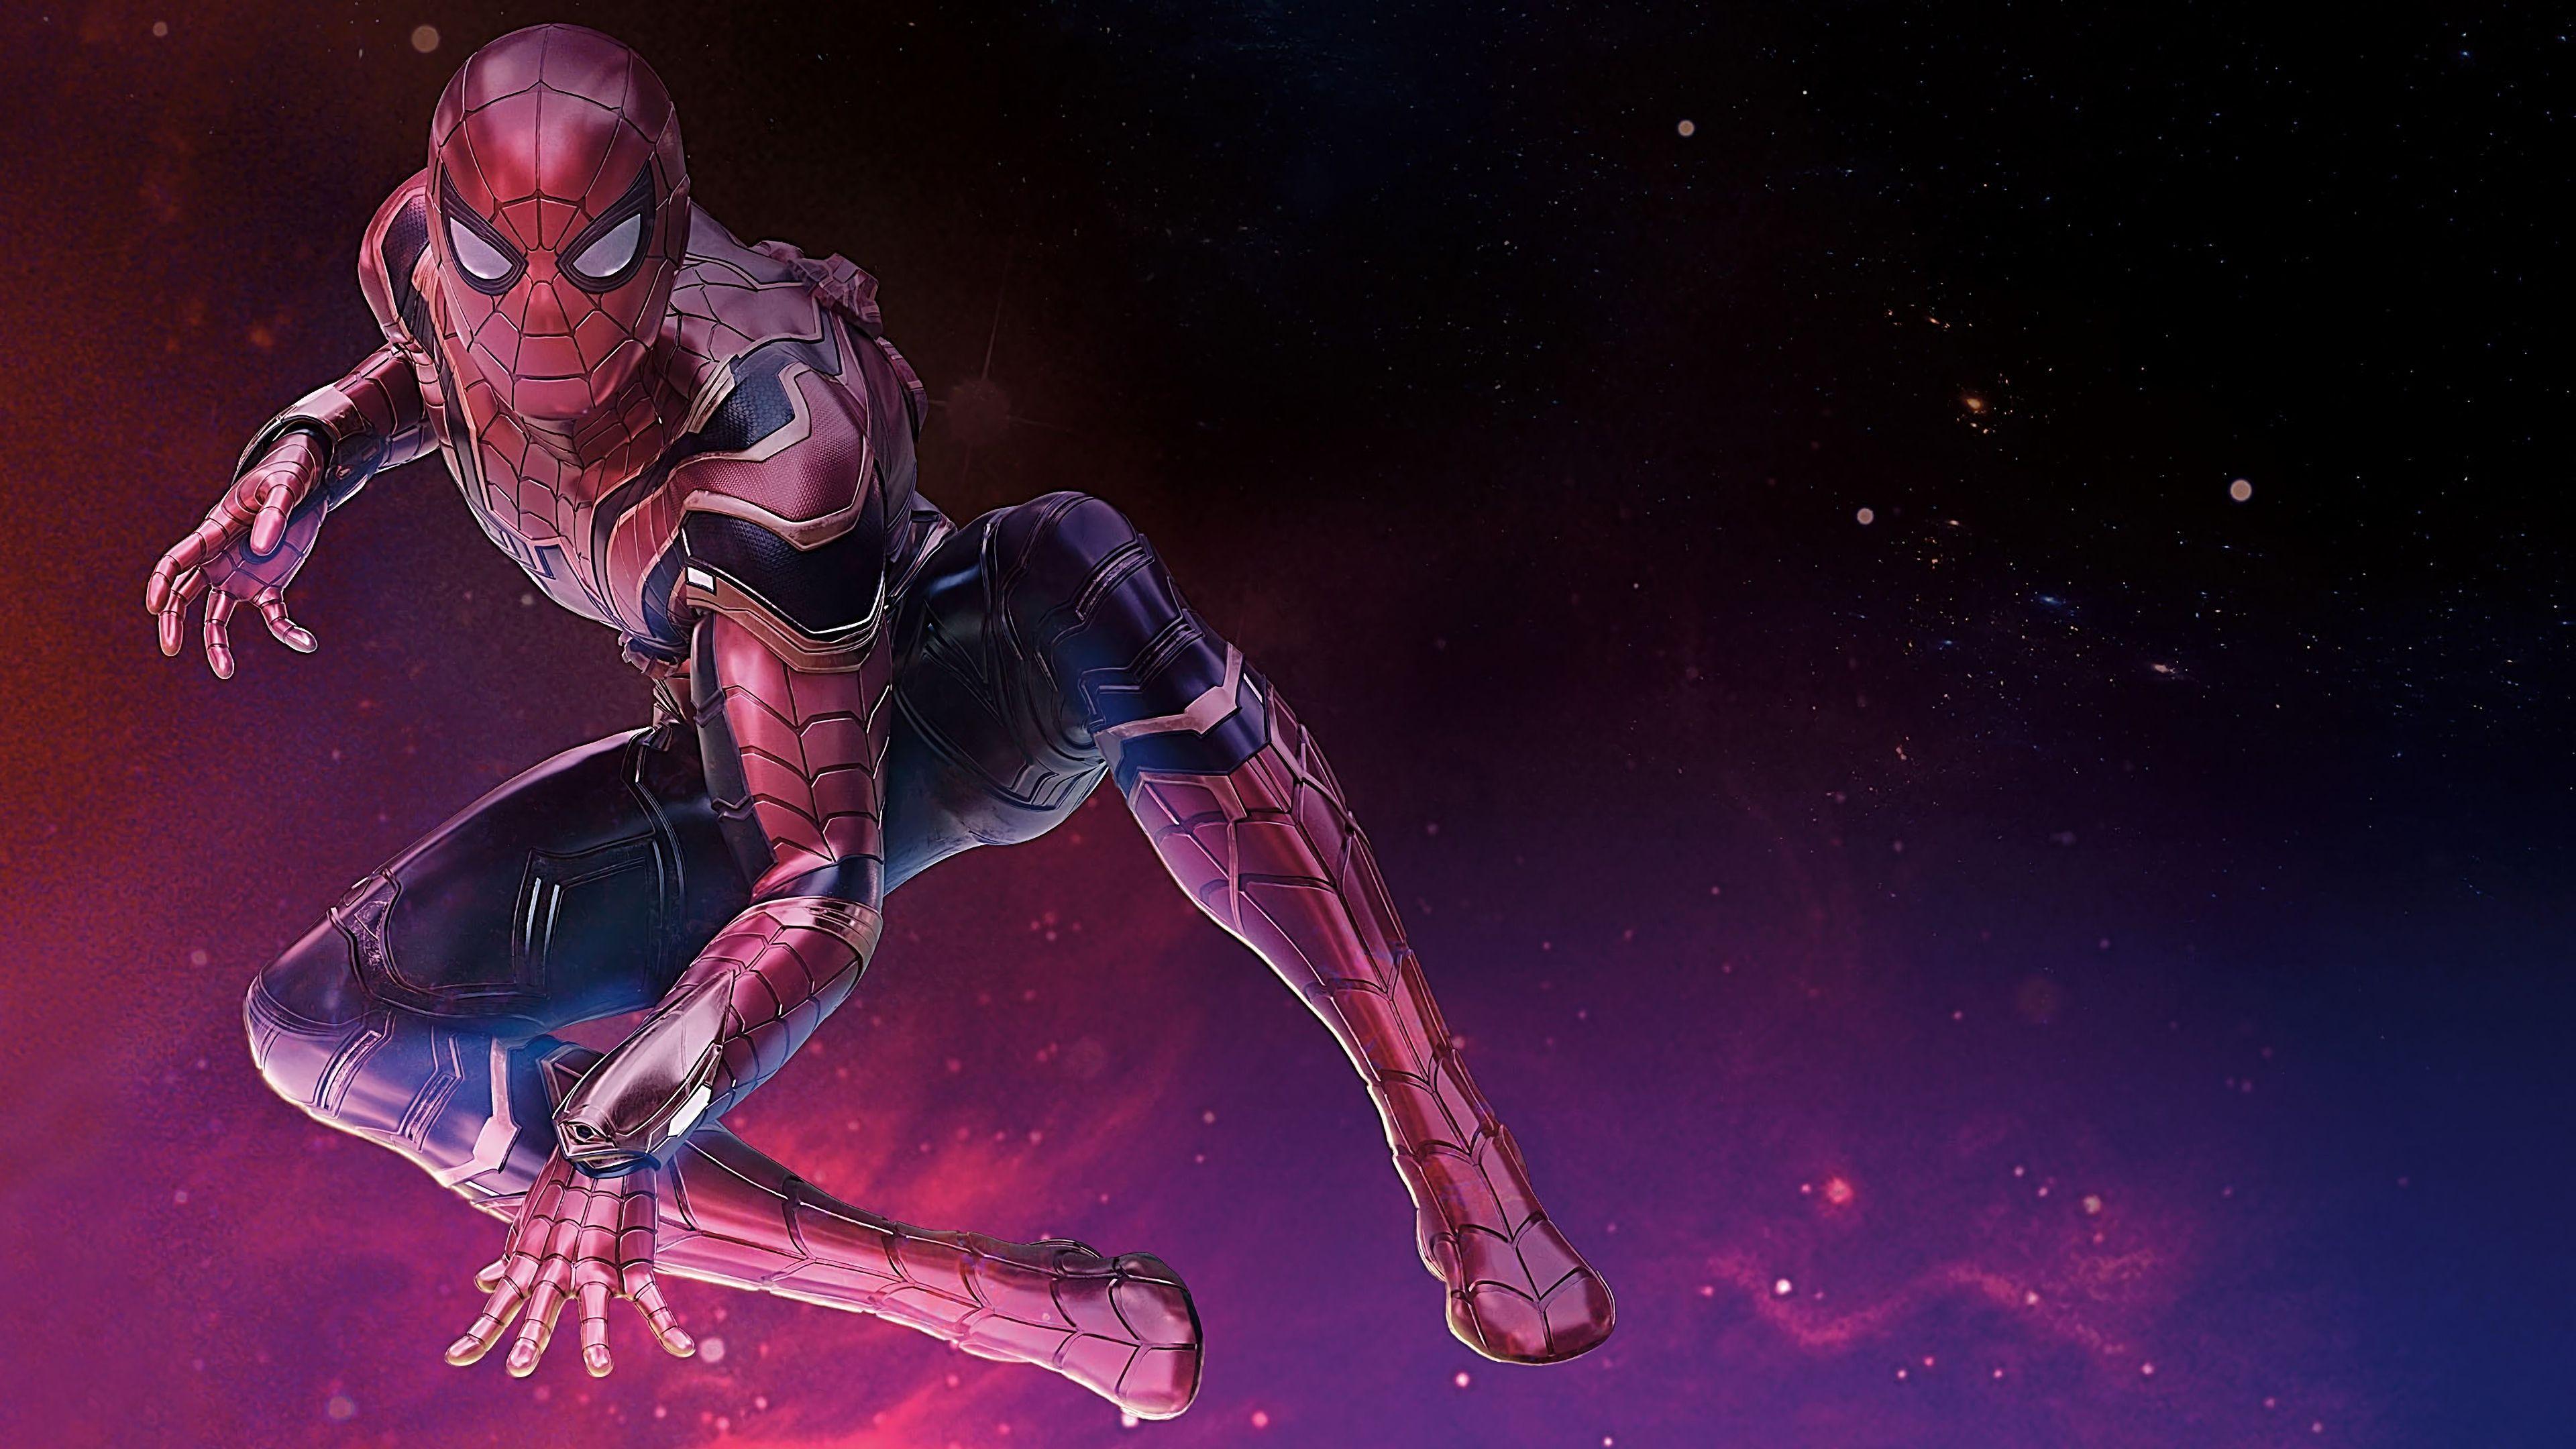 Spider Man Infinity War Wallpapers Wallpaper Cave